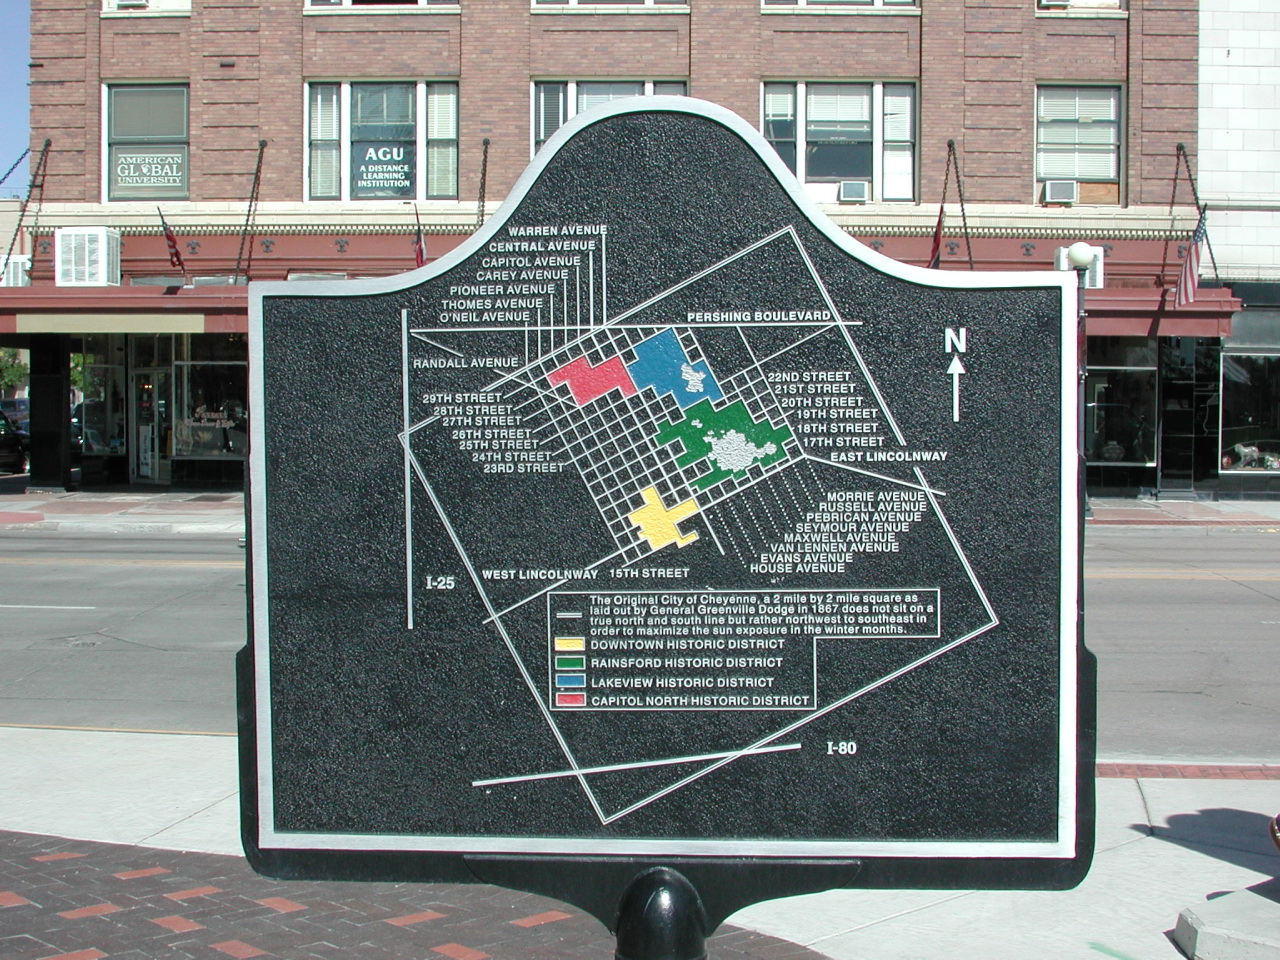 FileDowntown Cheyenne mapjpg Wikimedia Commons